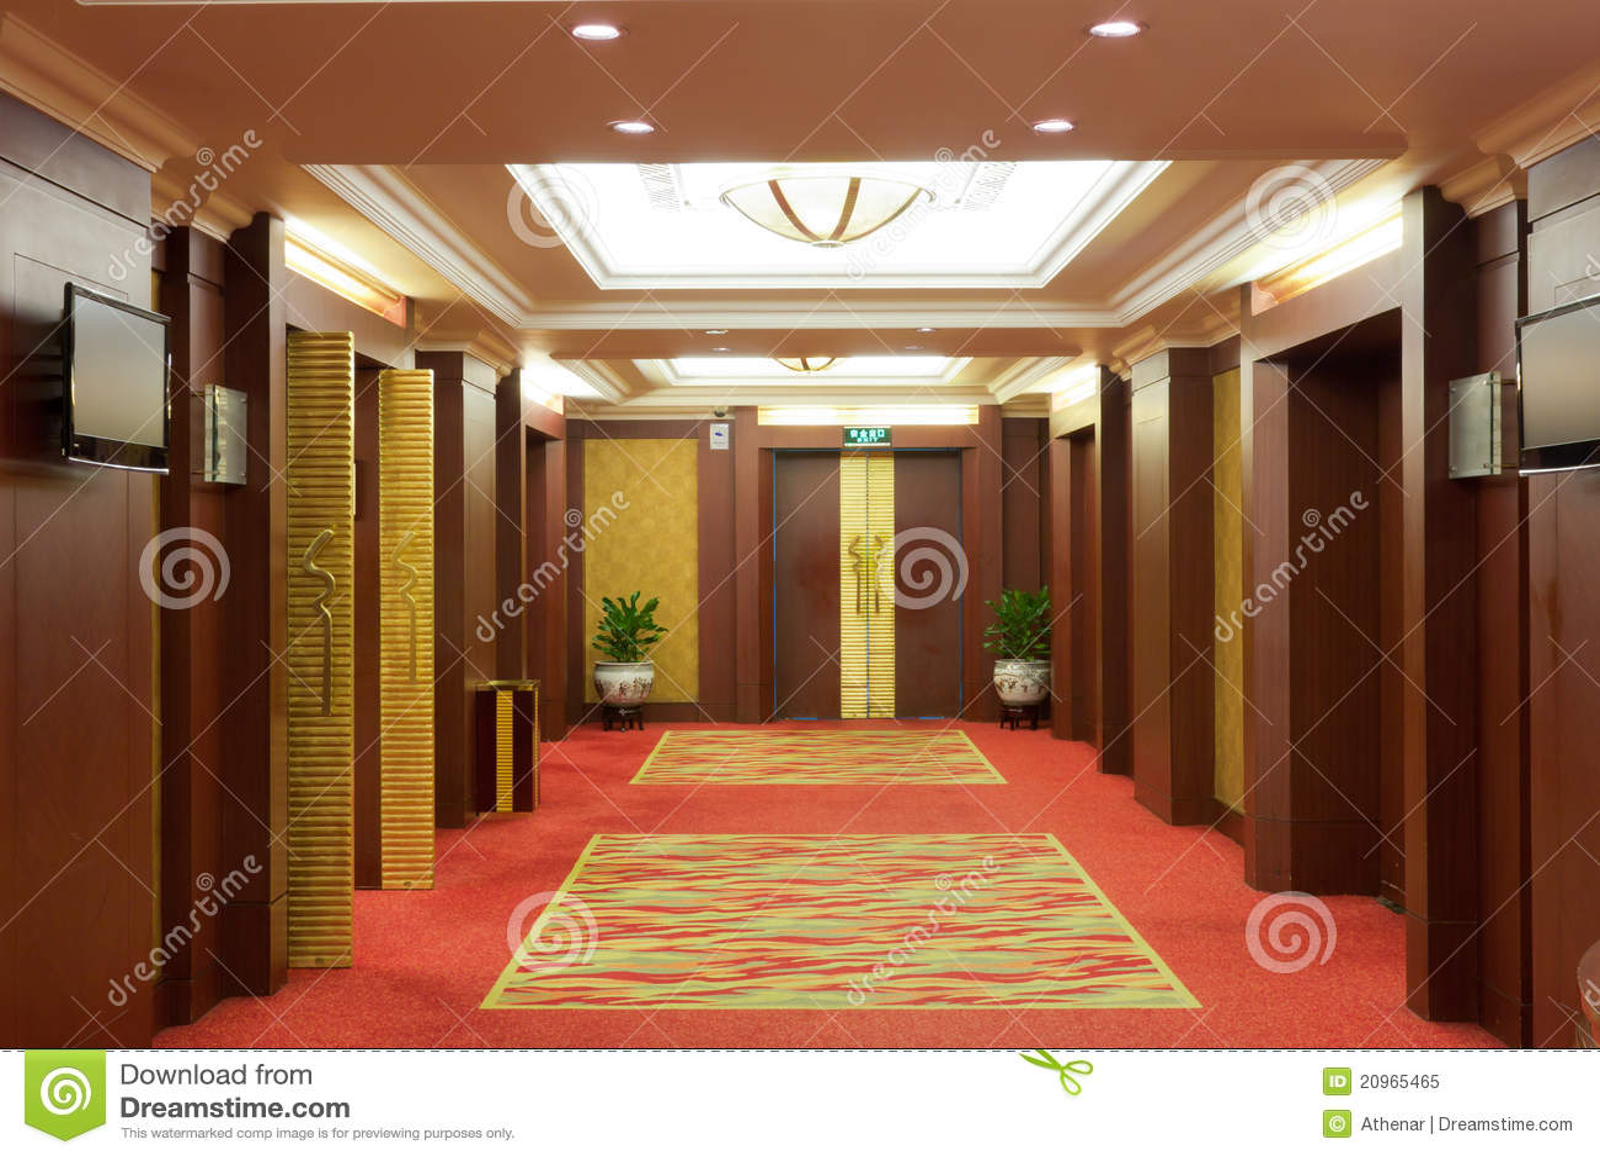 Tropical luxury hotel bedroom for Luxury hotel interior